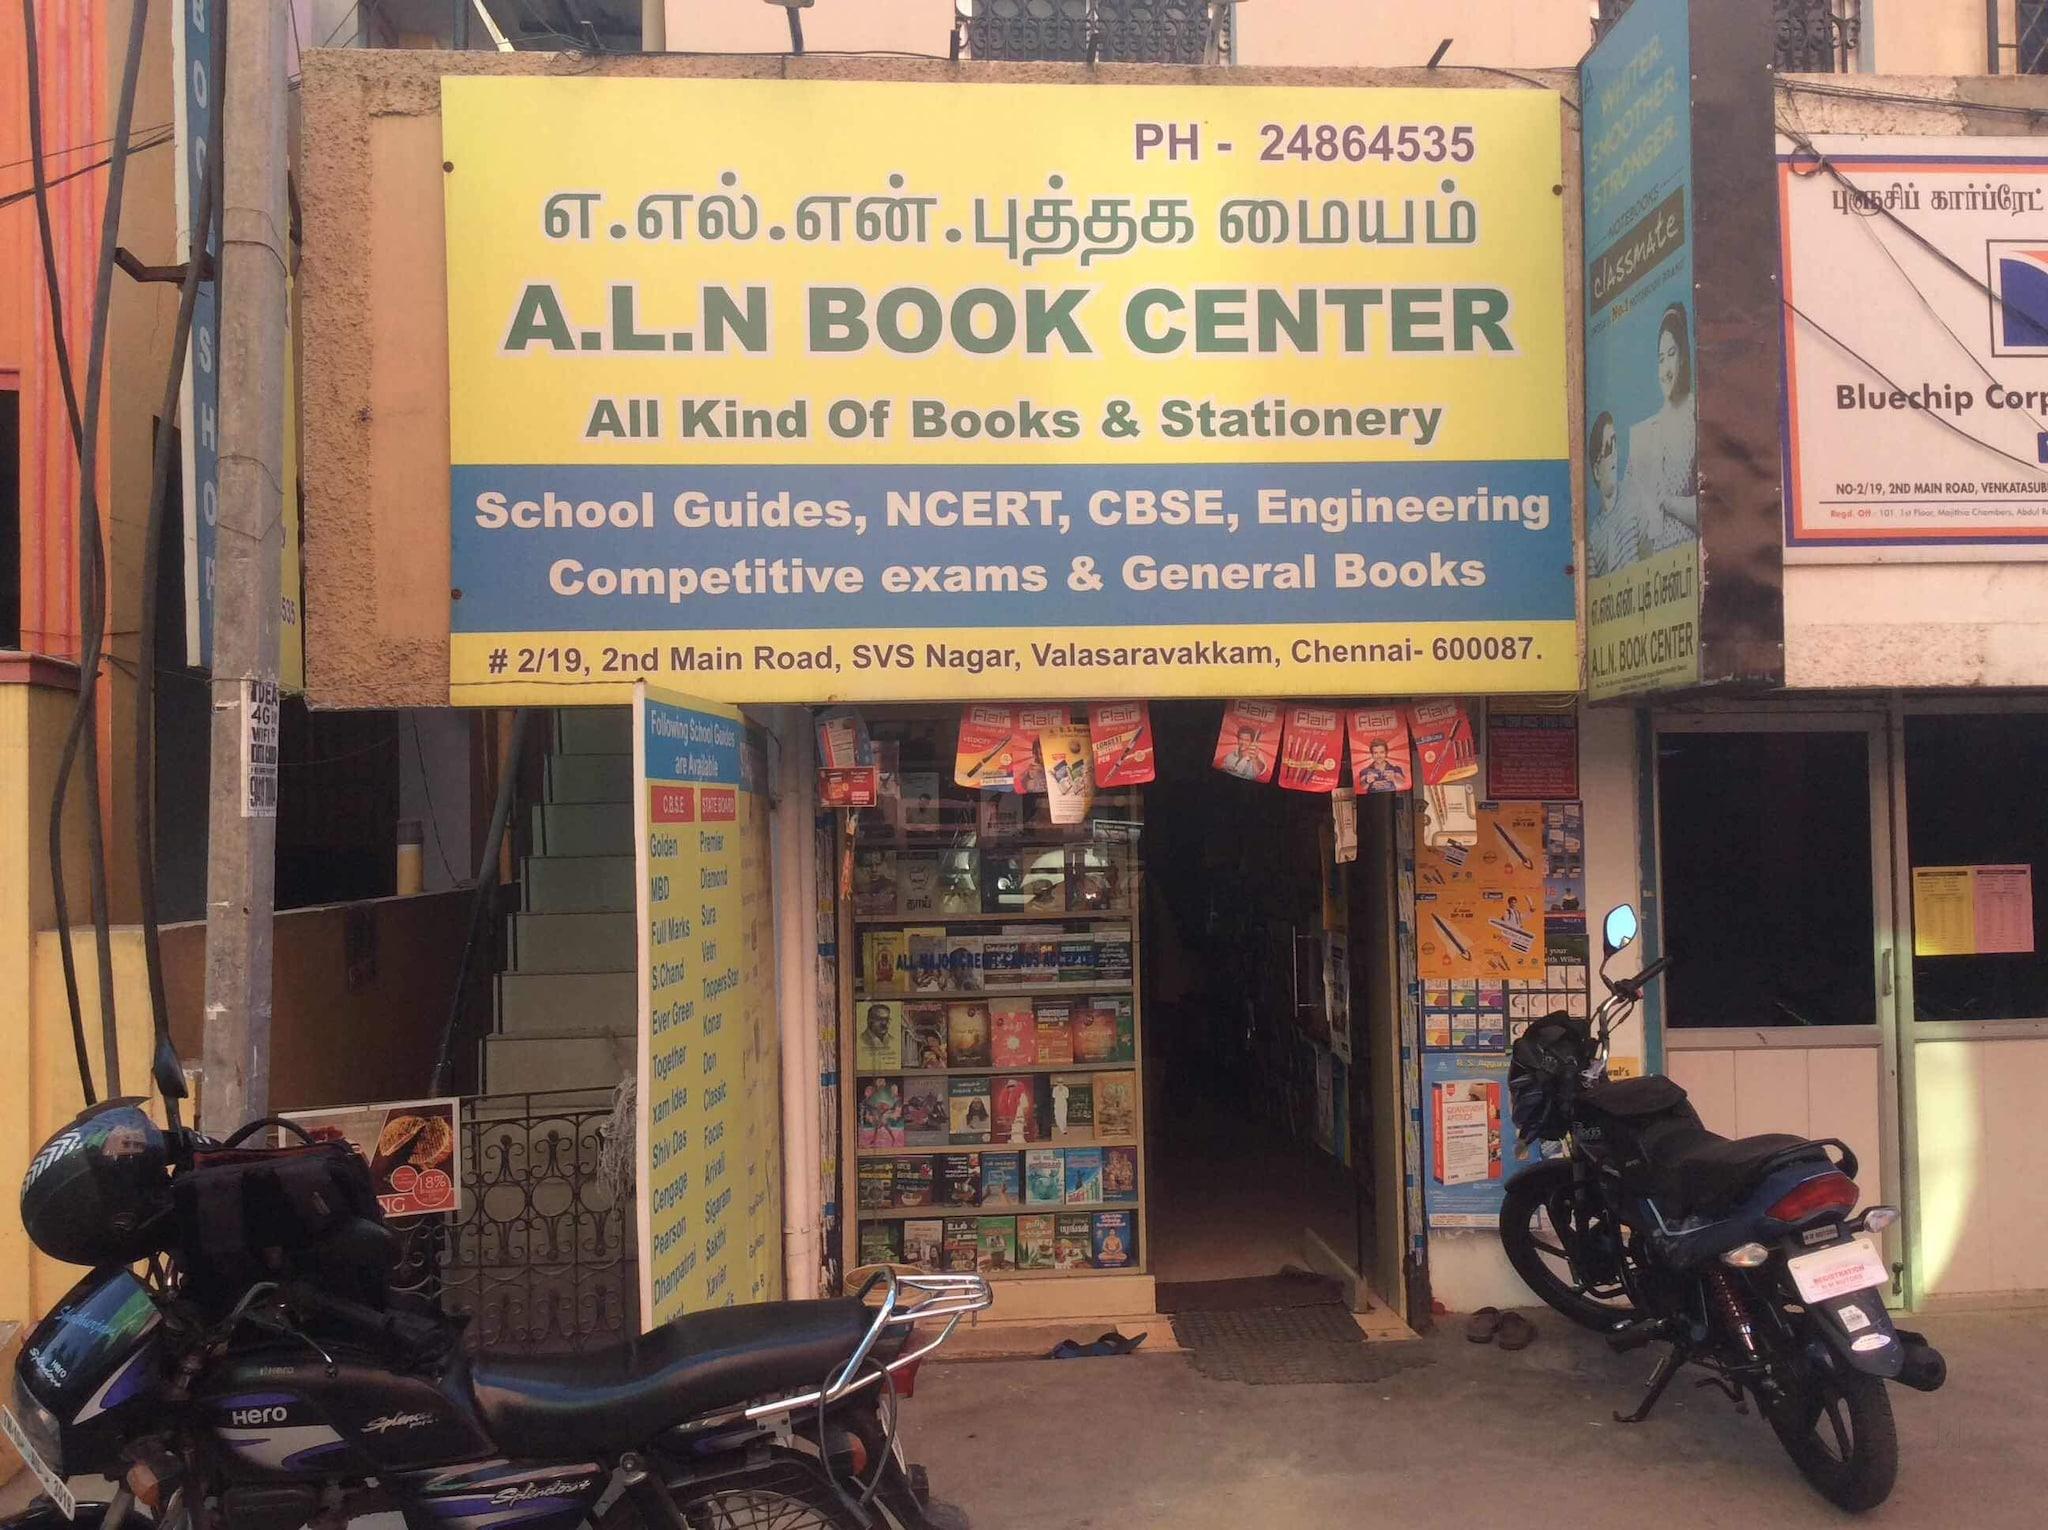 Top 10 Best Bookstores in Porur, Chennai - Best Book shops - Justdial